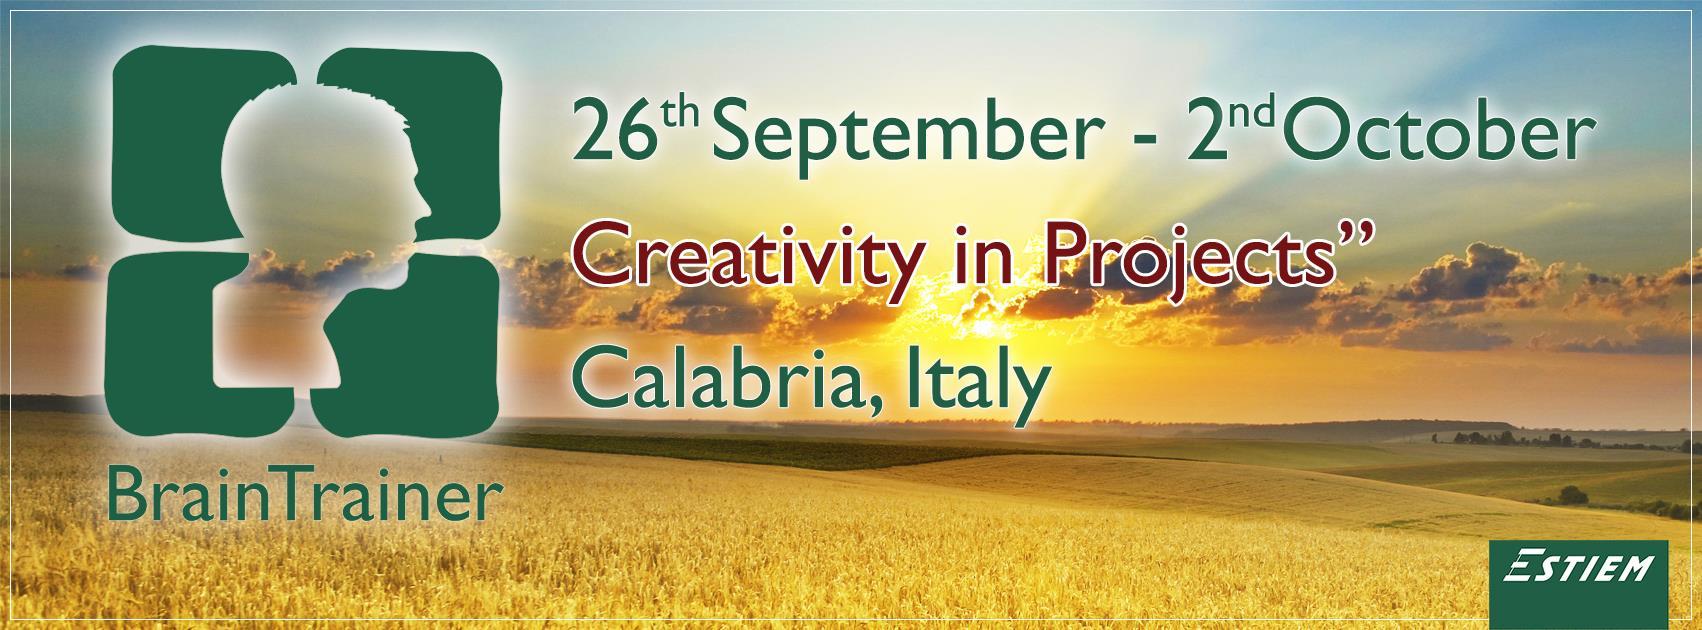 BrainTrainer_LG_Calabria